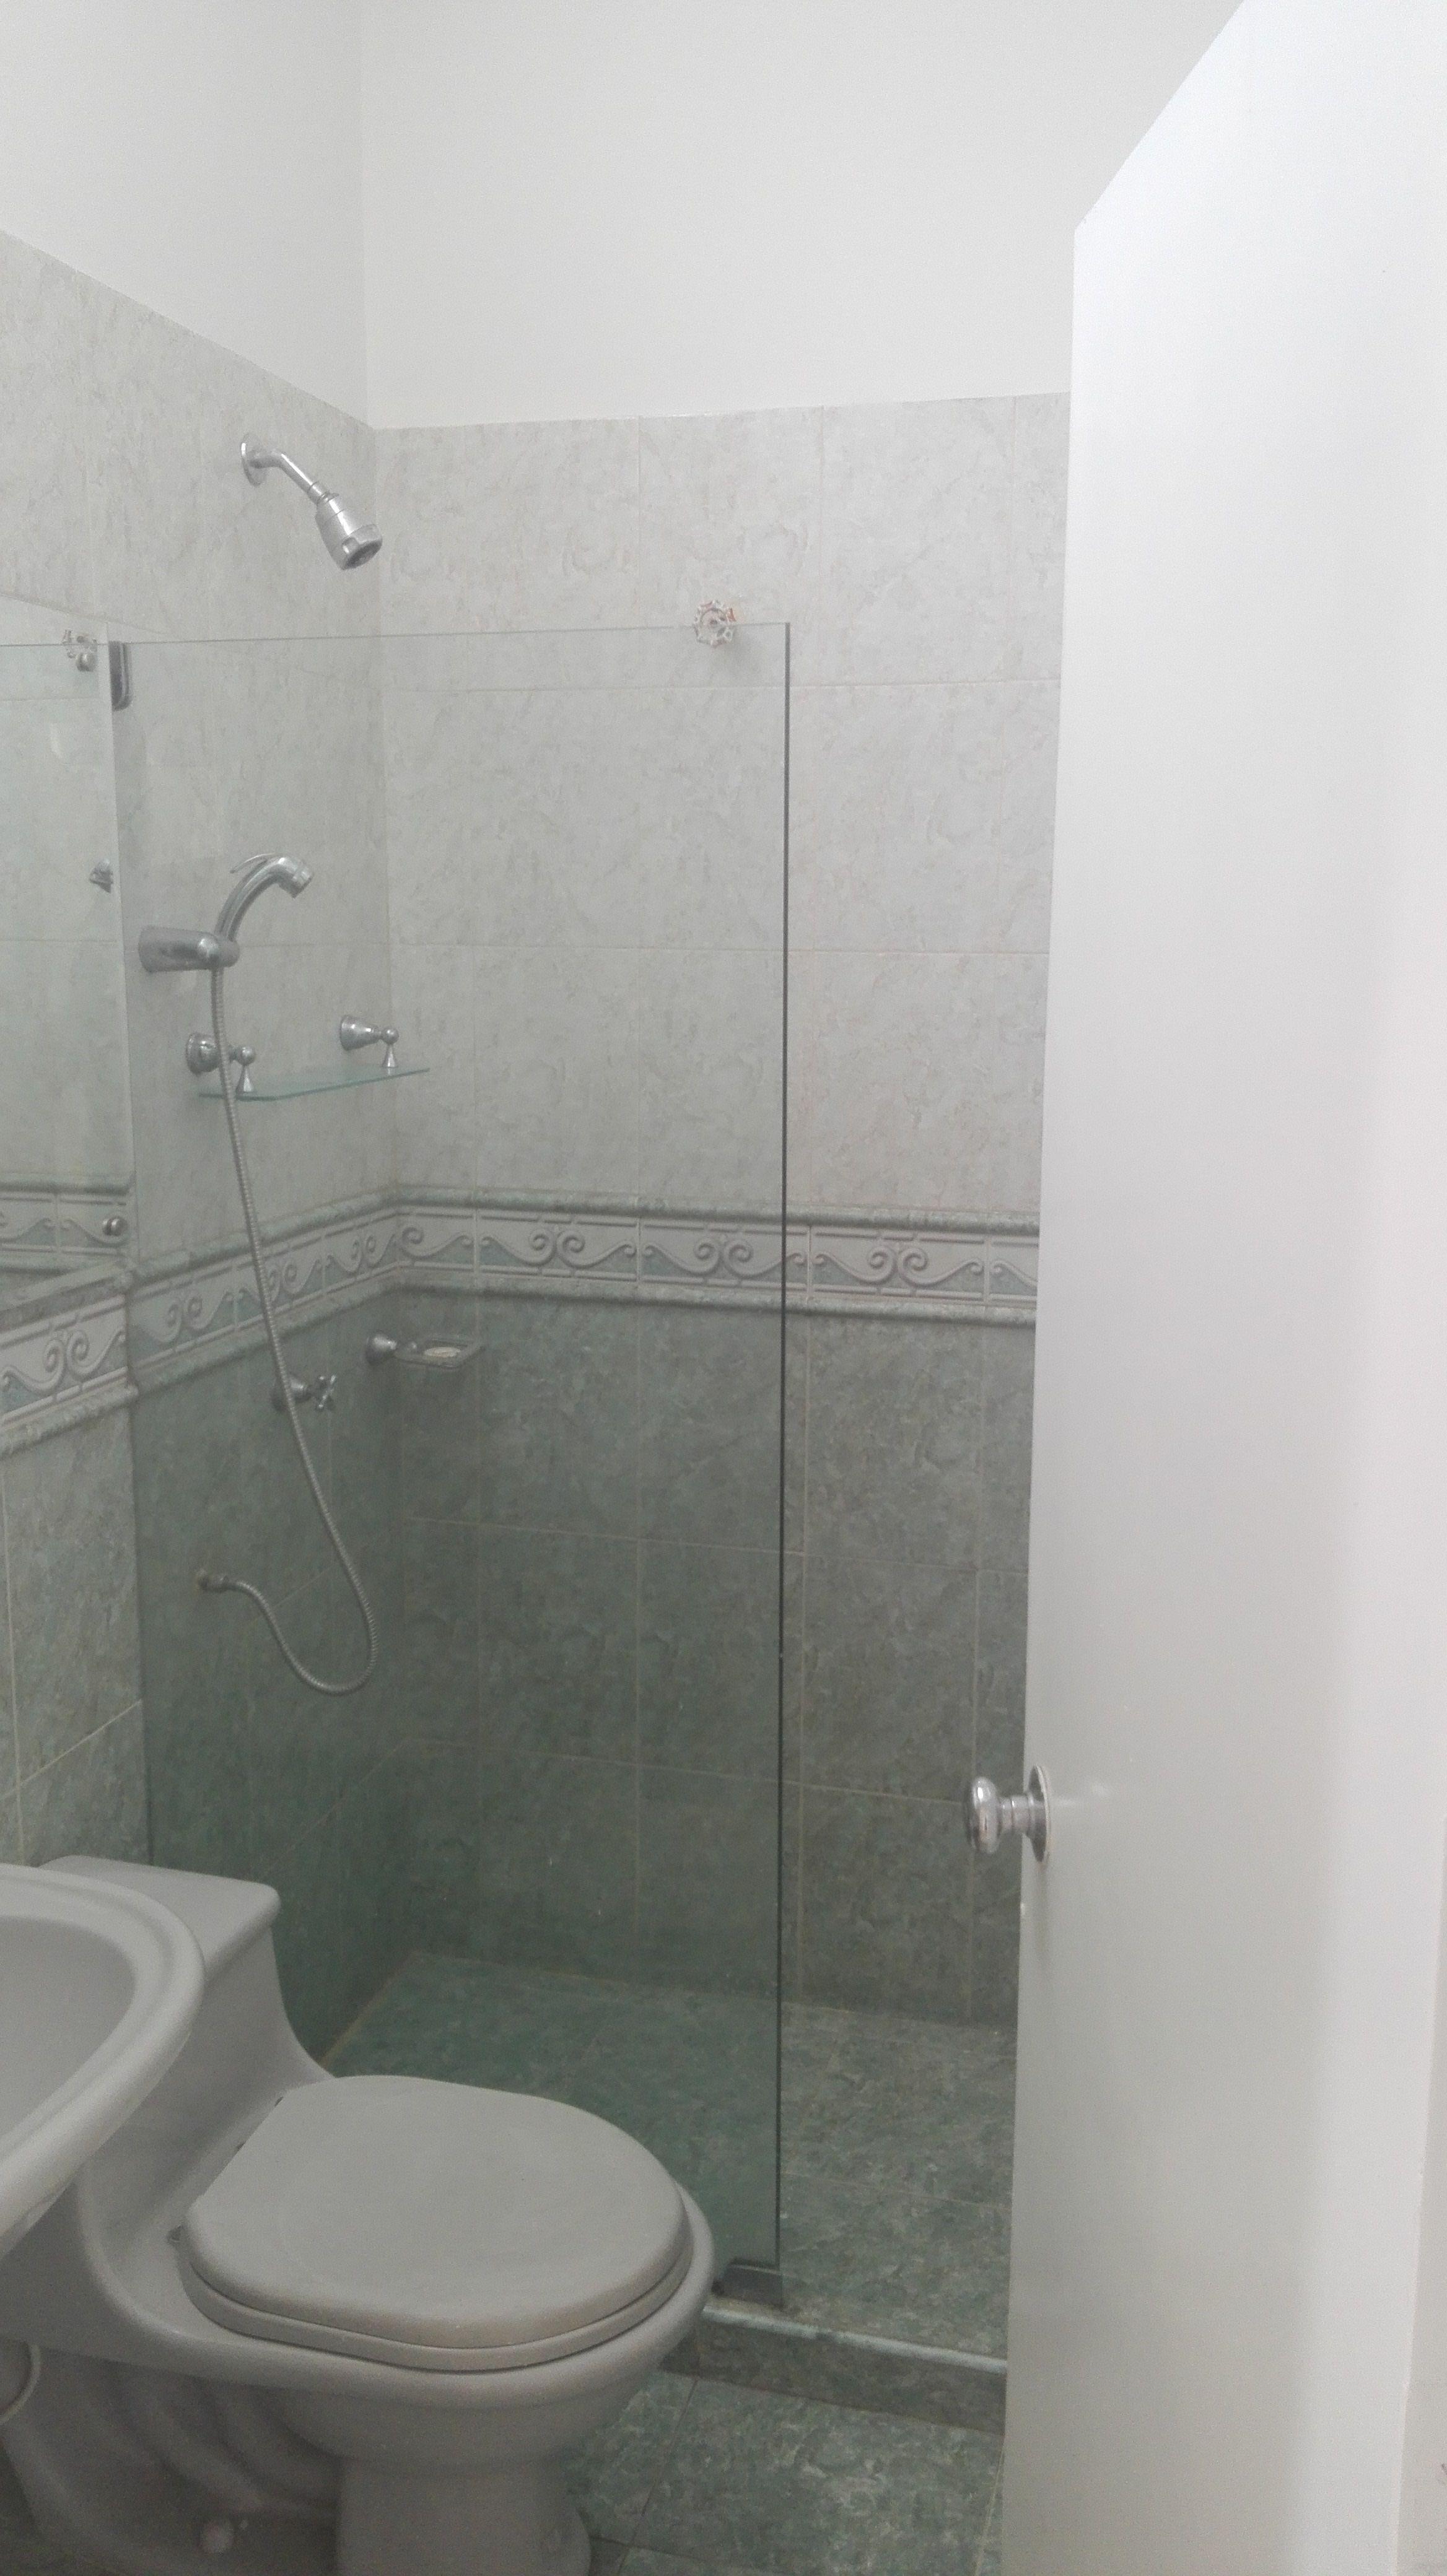 Baño compartido del segundo piso